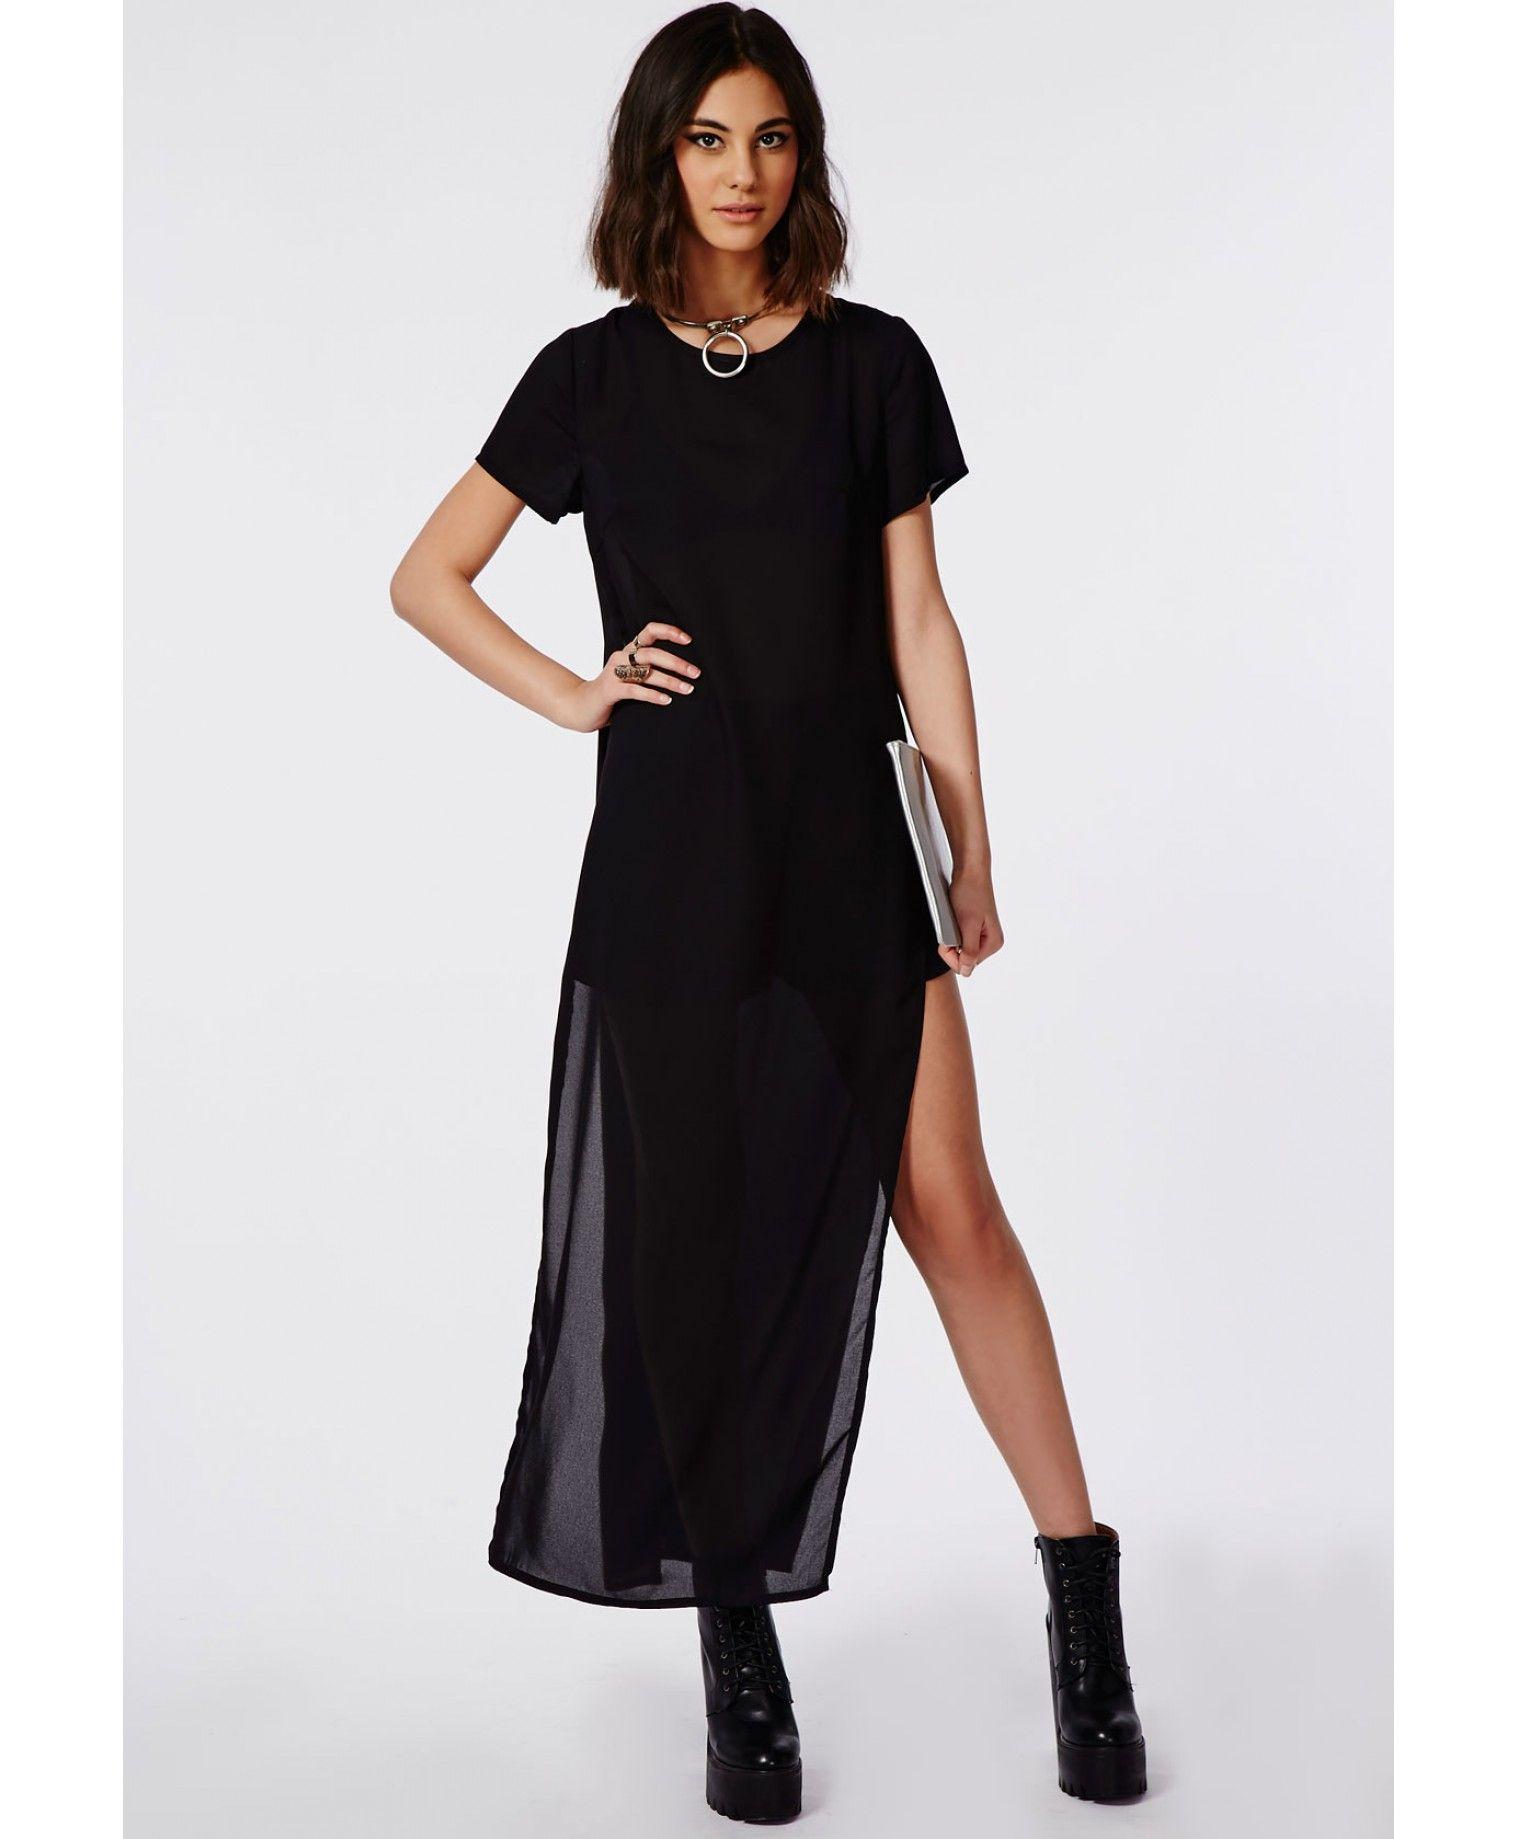 31faa704ee6 Crepe Split Side Maxi T-Shirt Dress Black - Dresses - T-Shirt Dresses -  Missguided